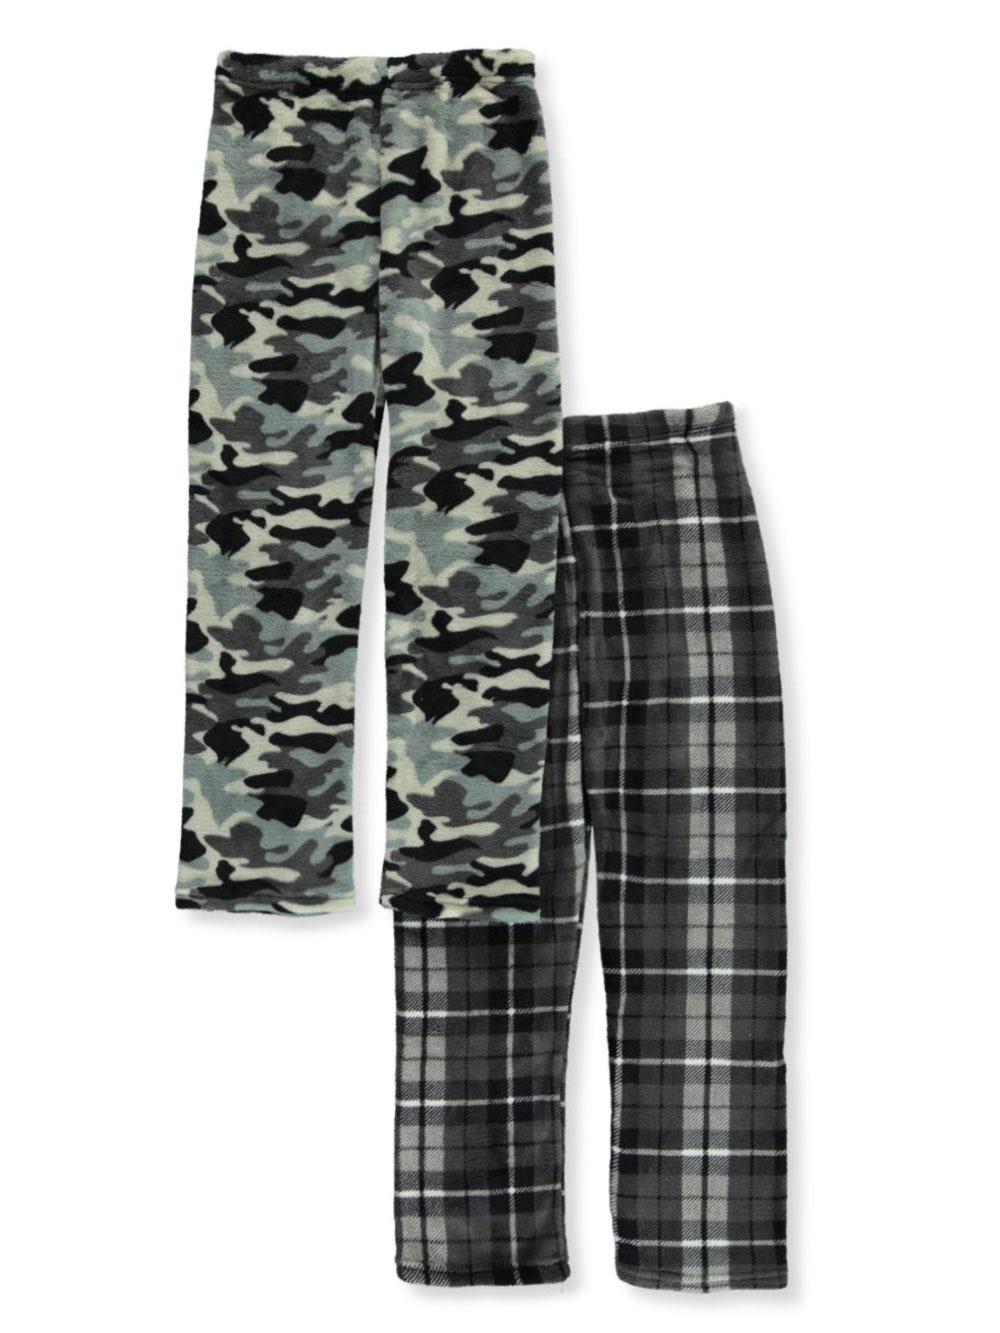 Boyz Club Kids Pajama Bottoms Camo Camouflage Fleece Lounge Pants